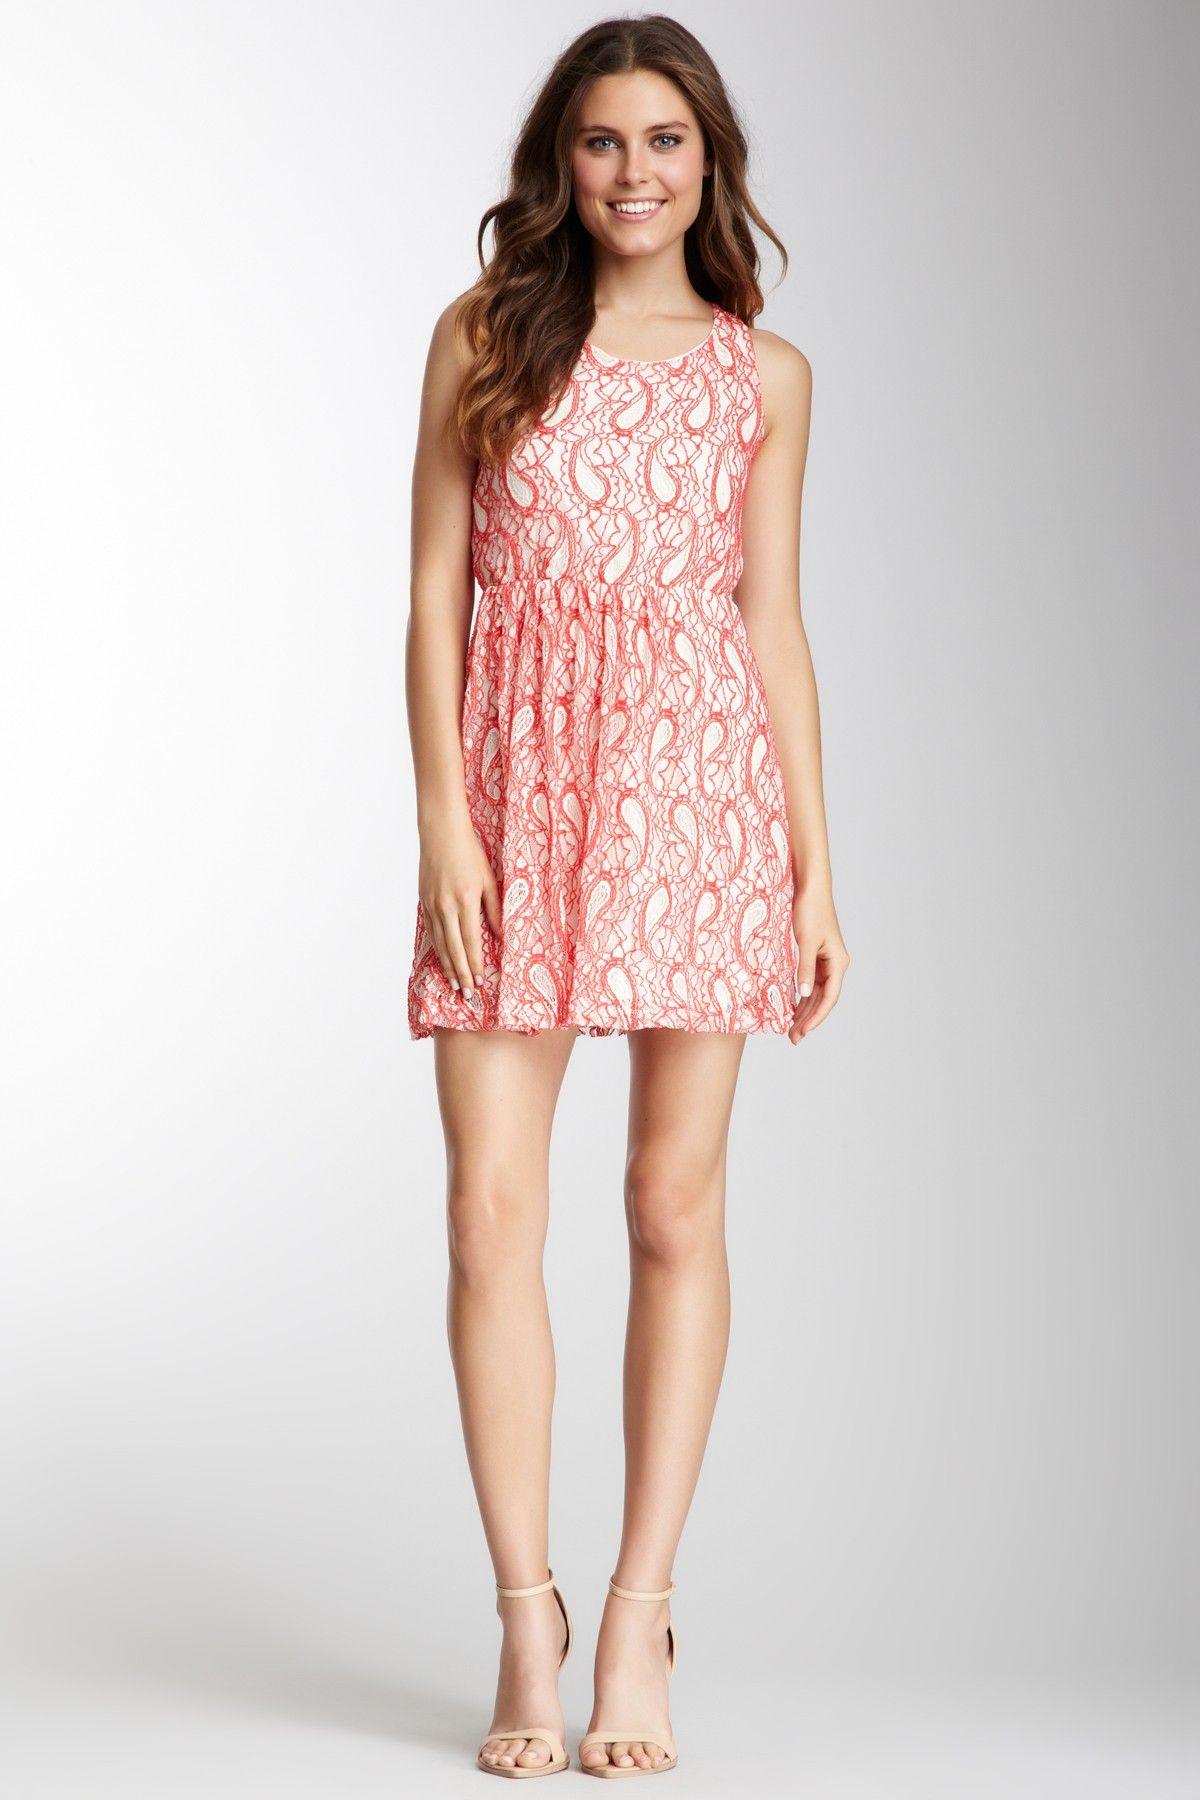 Lace Dress | My Style | Pinterest